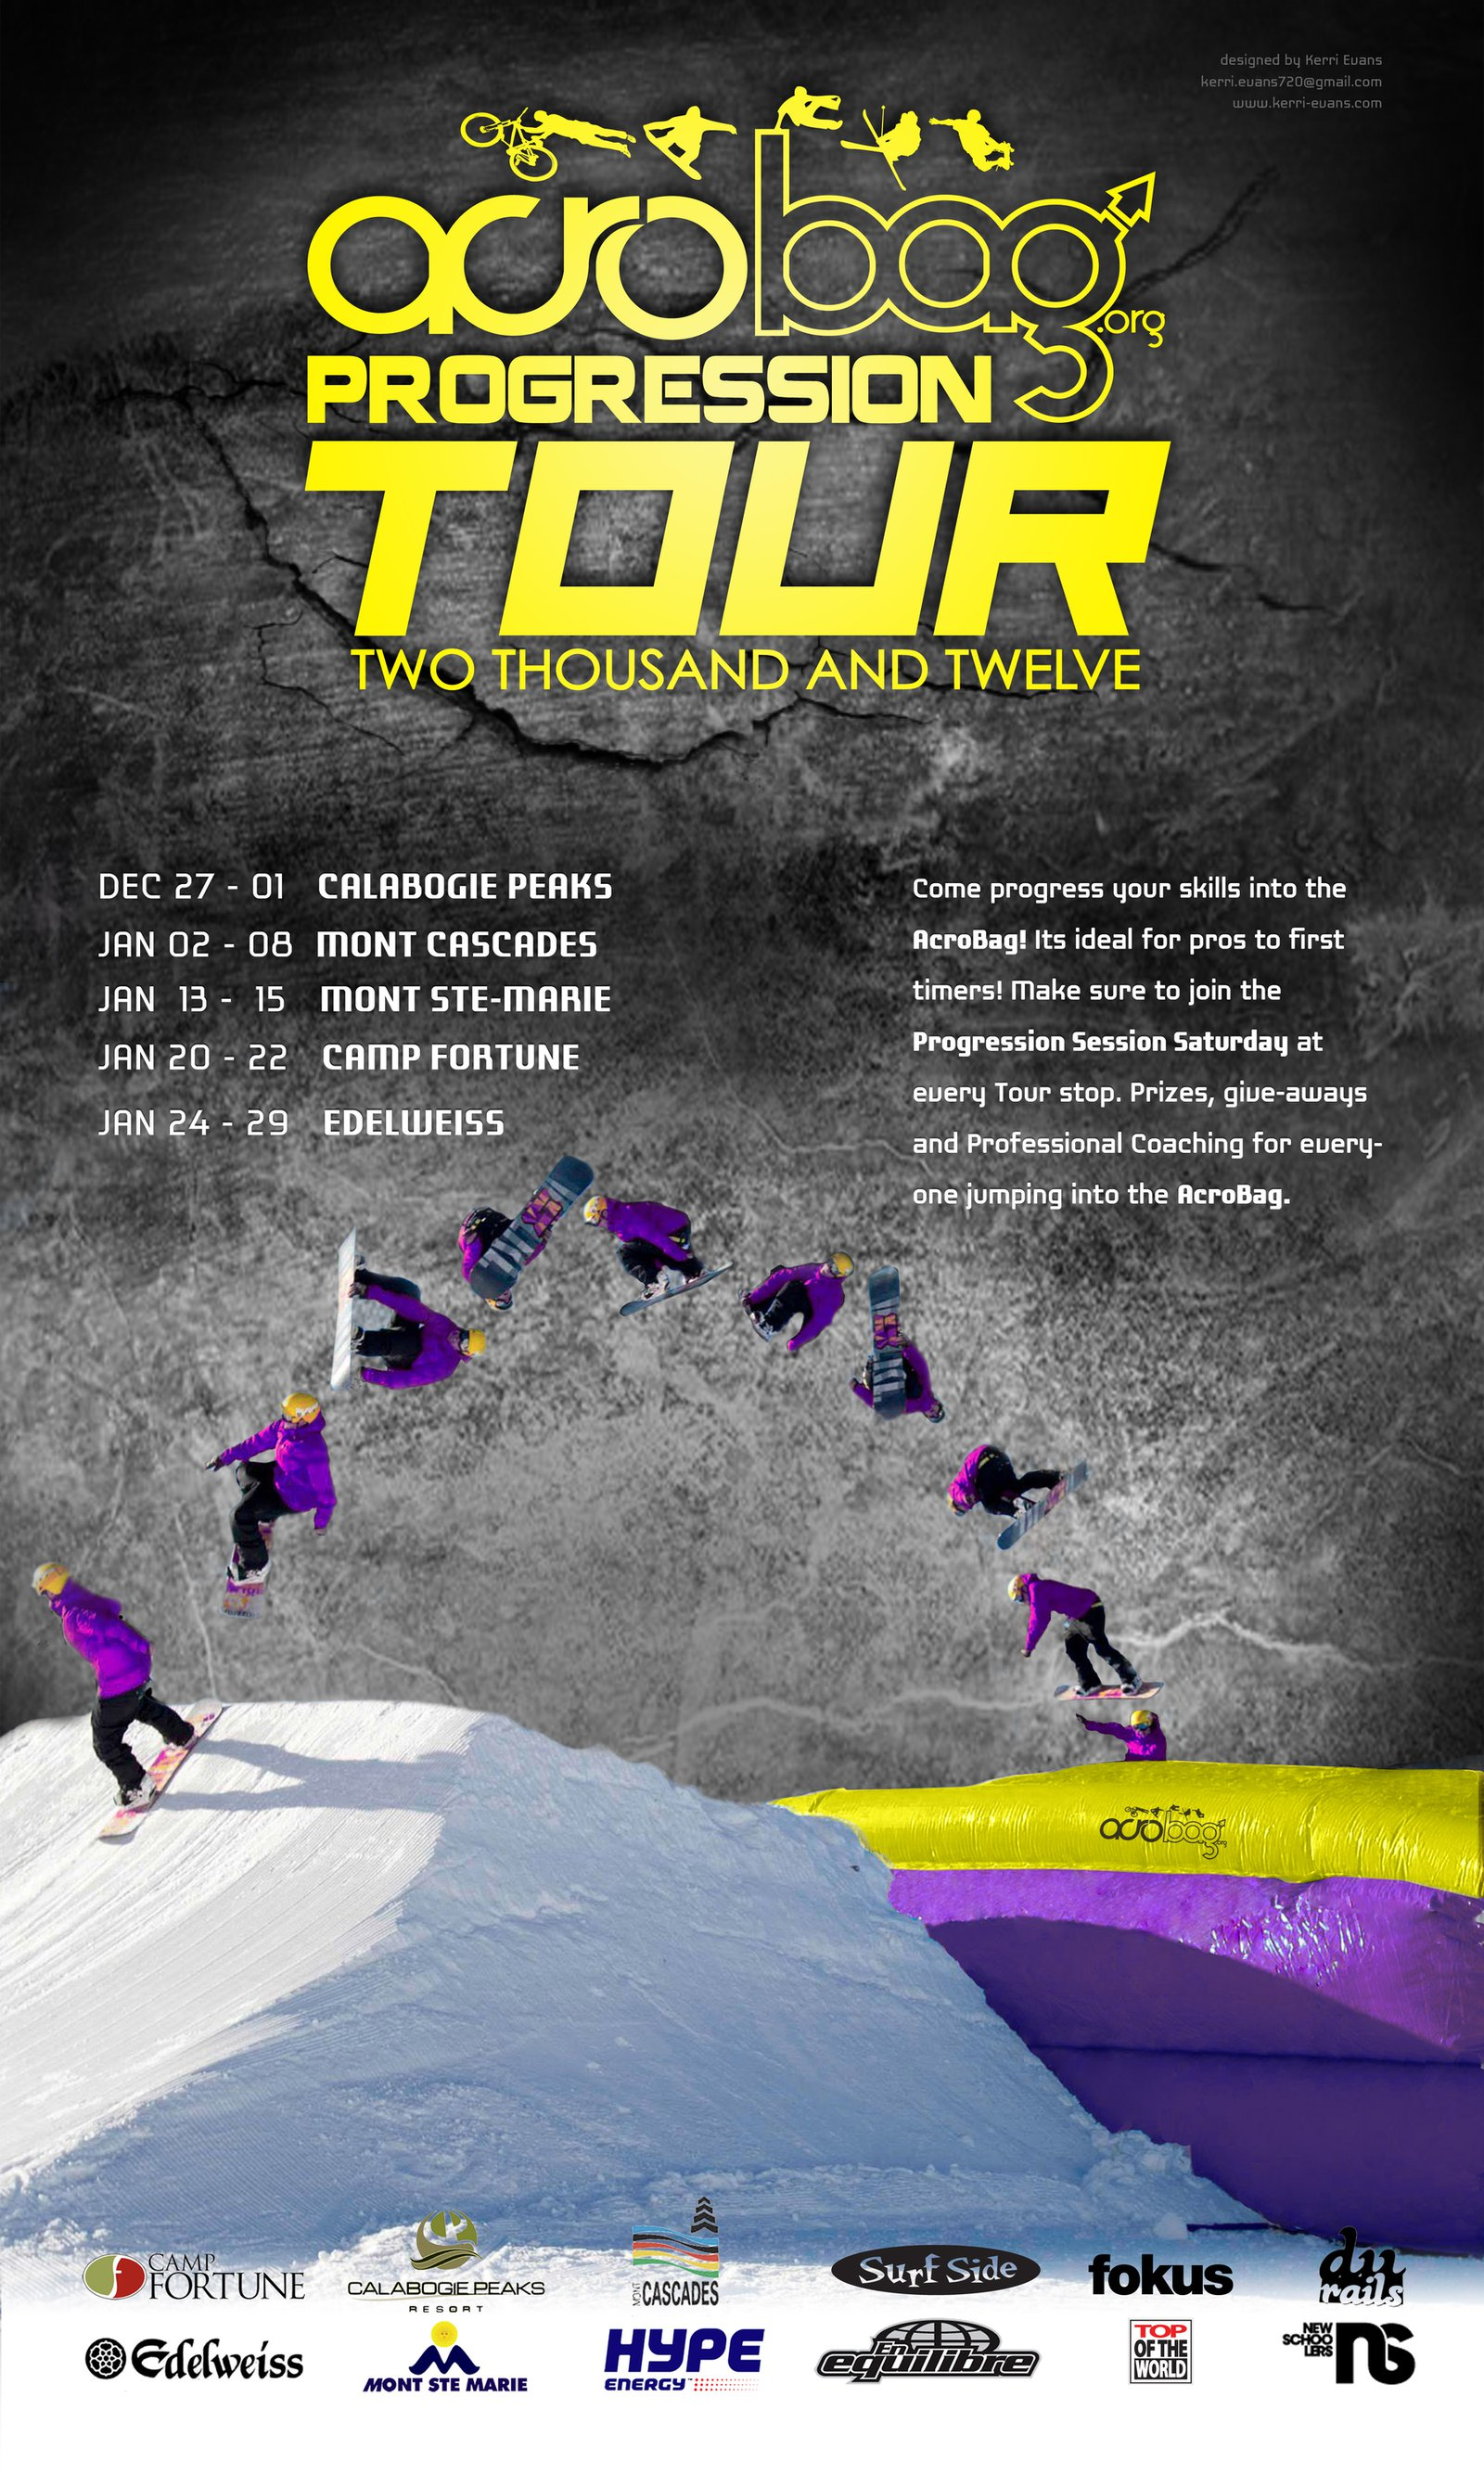 THE PROGRESSION TOUR 2012